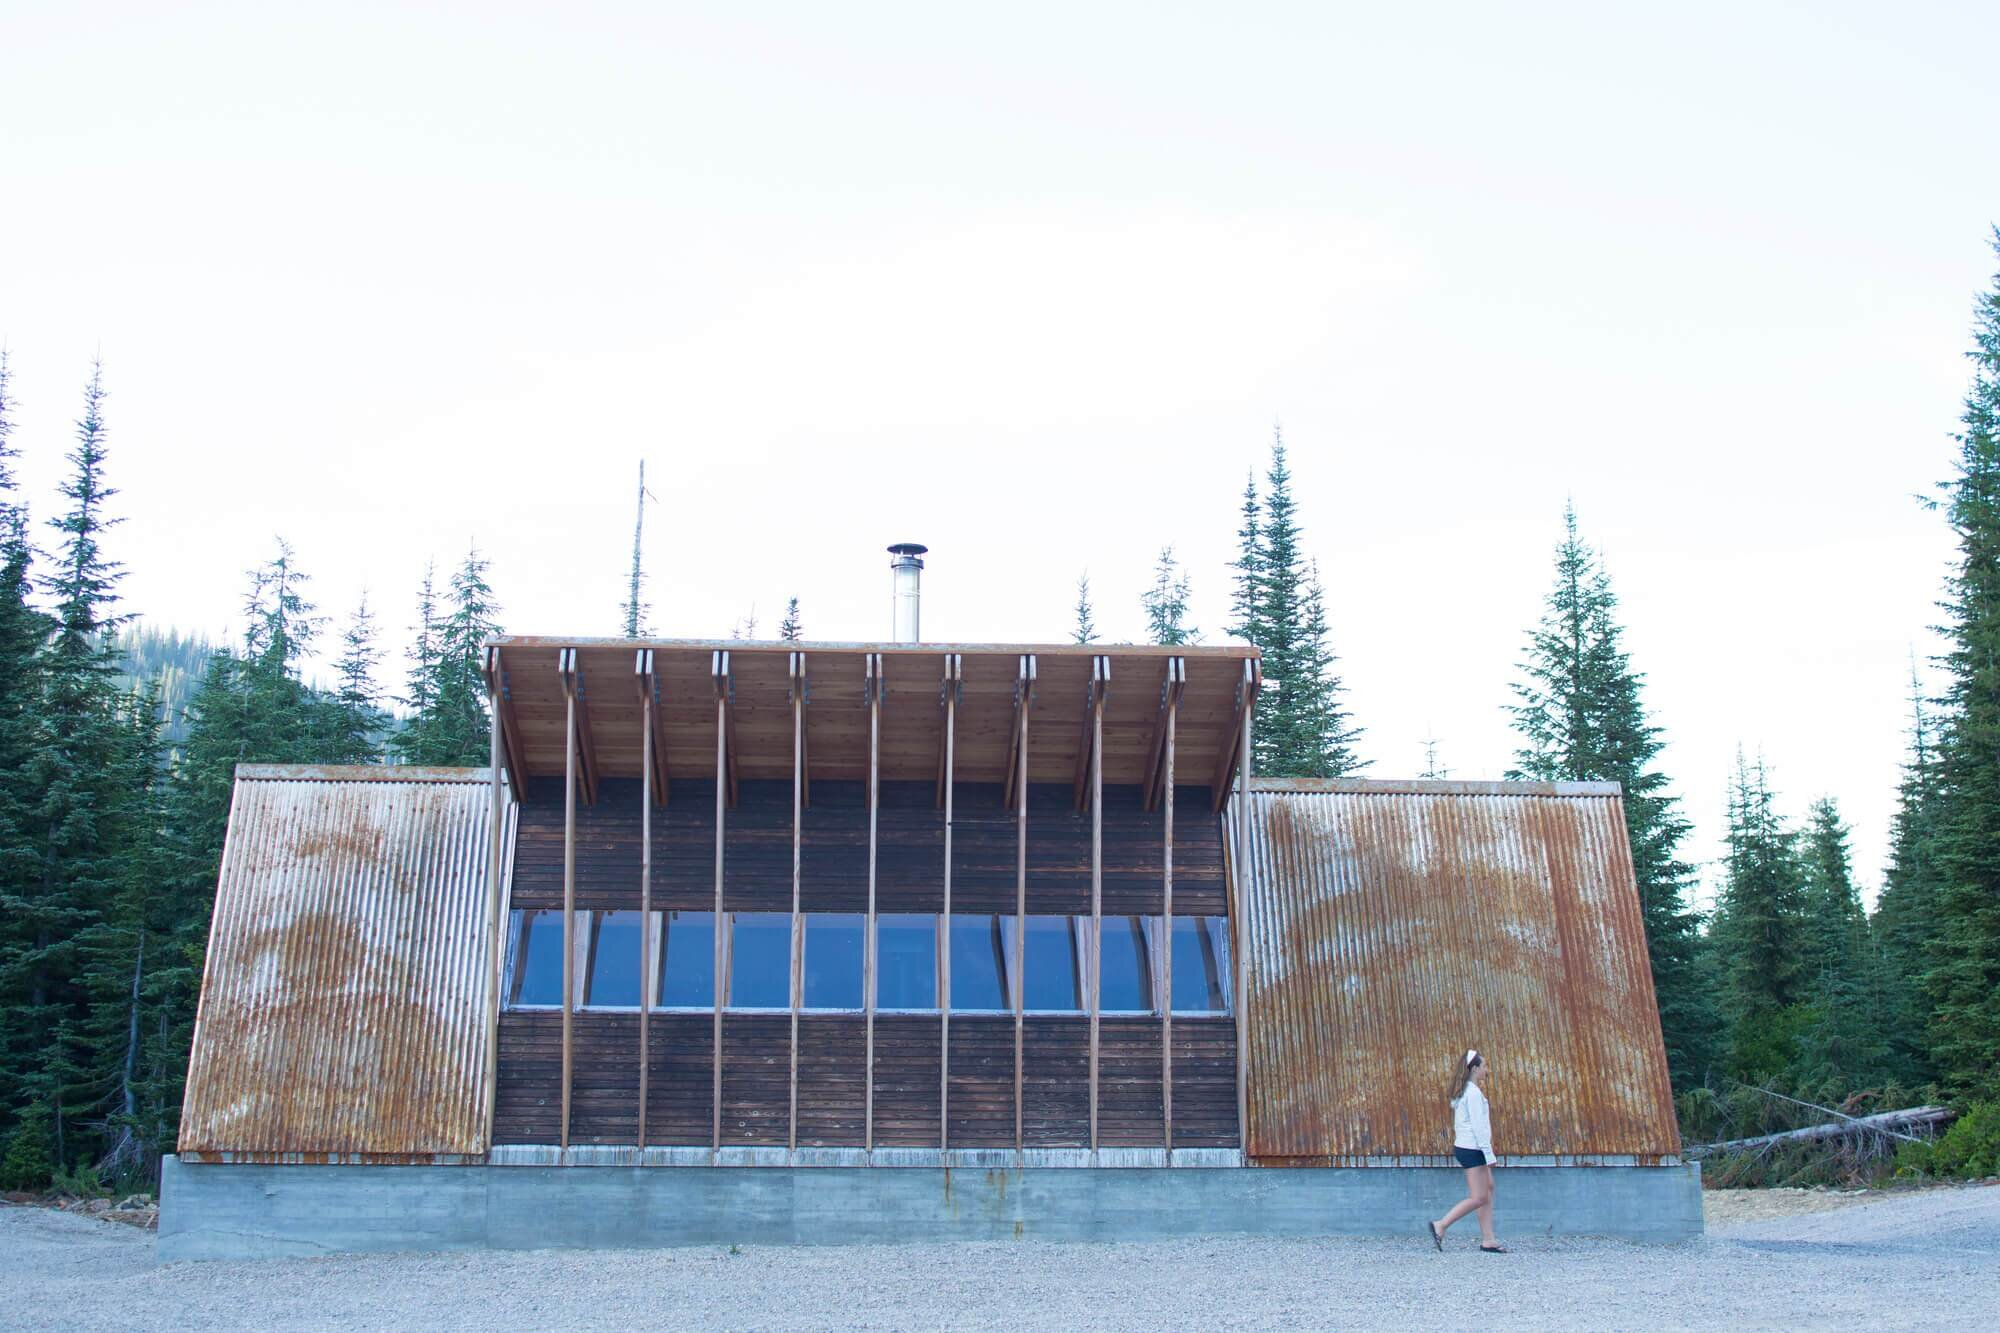 Moose-Creek-Warming-Hut-University-of-Idaho-Design-Build-Program-United-States-0